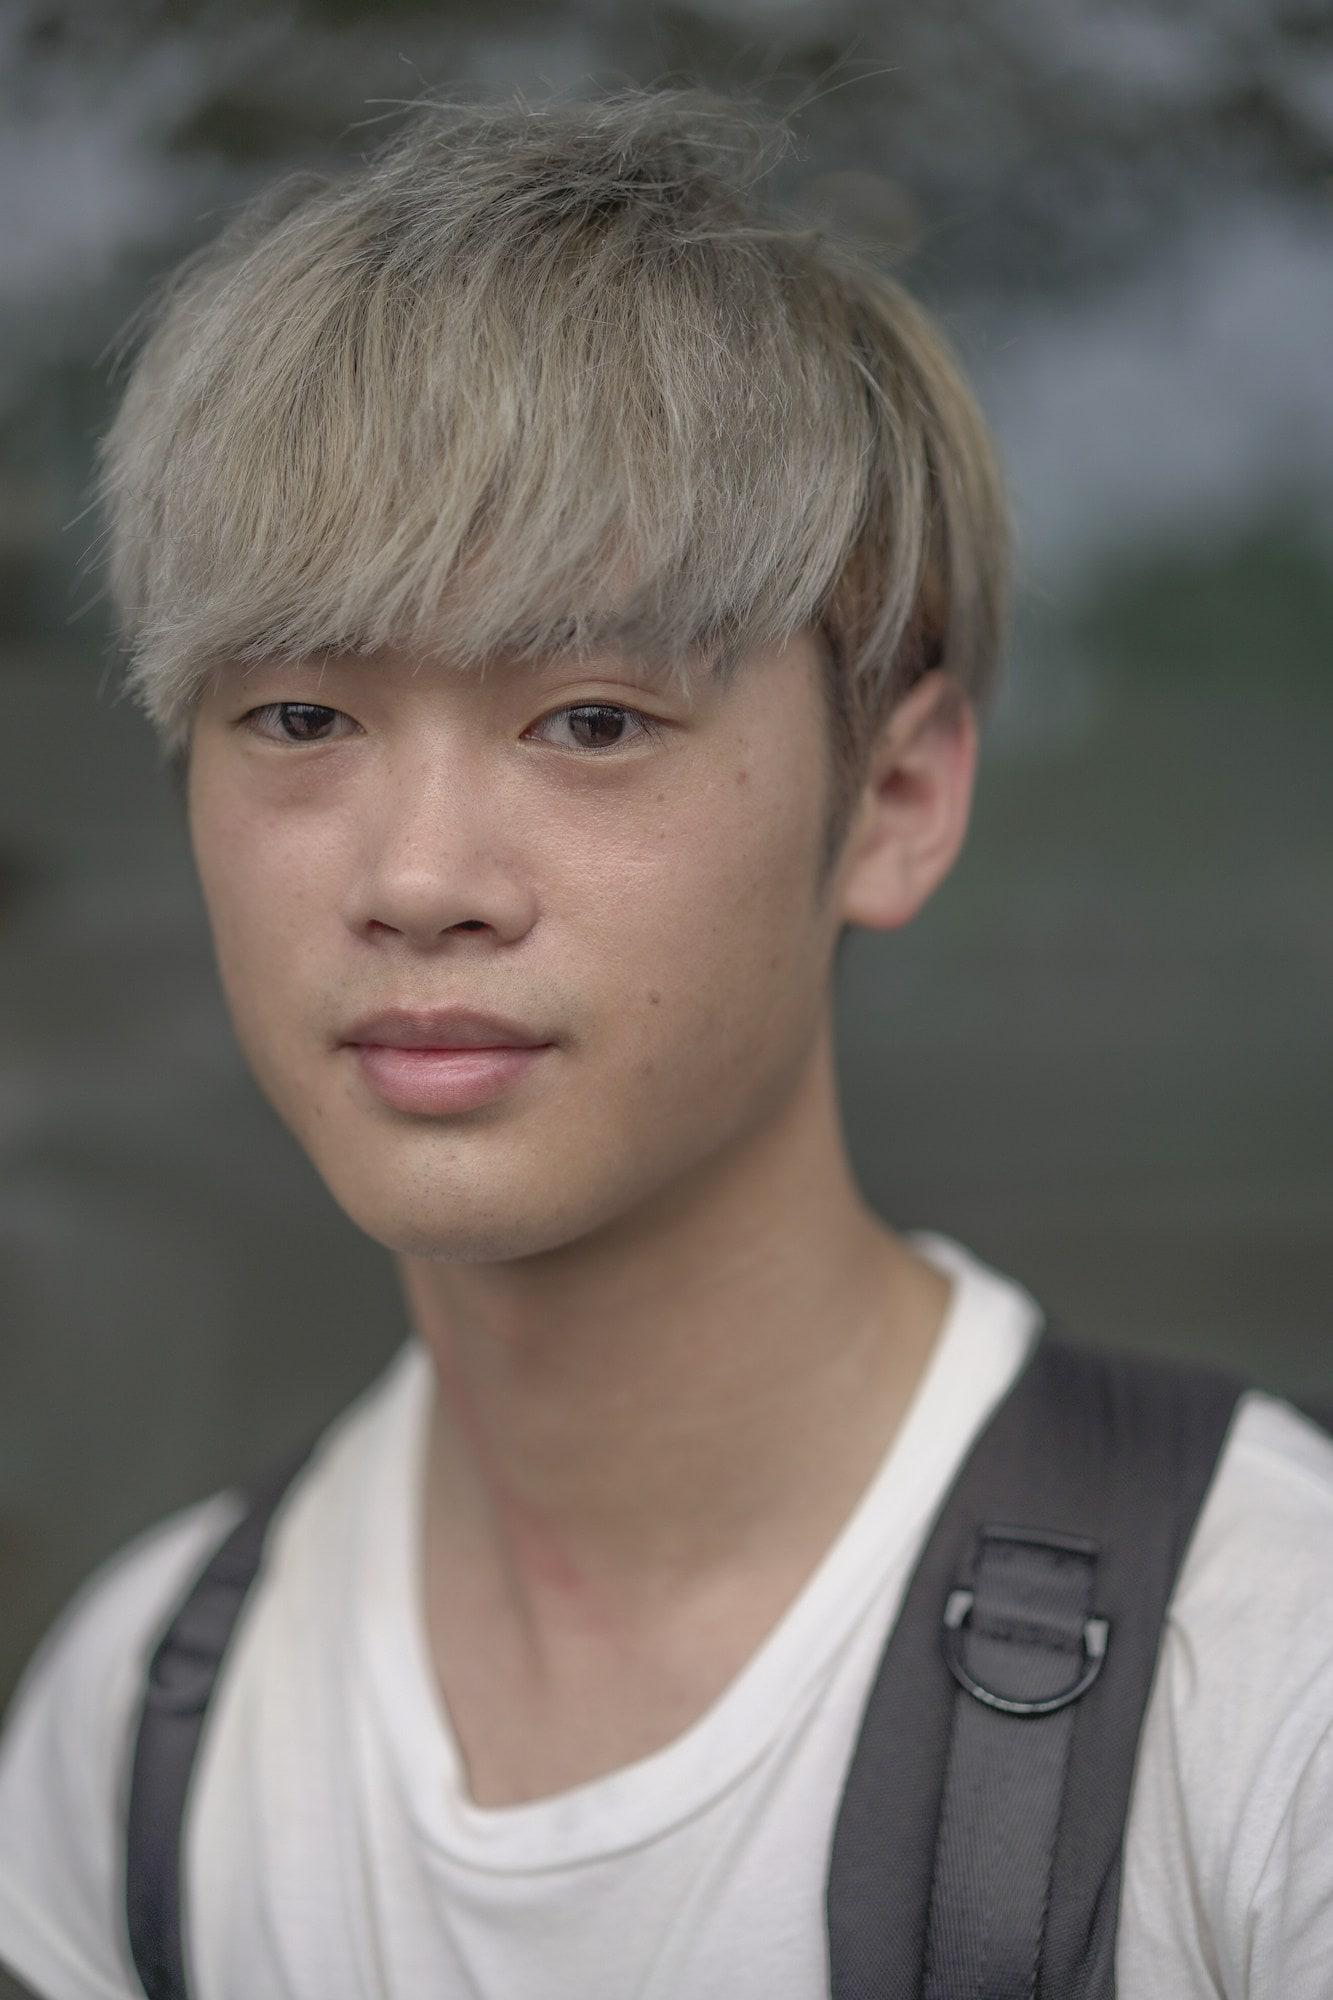 Gaya rambut korea pria pada super kpop festival